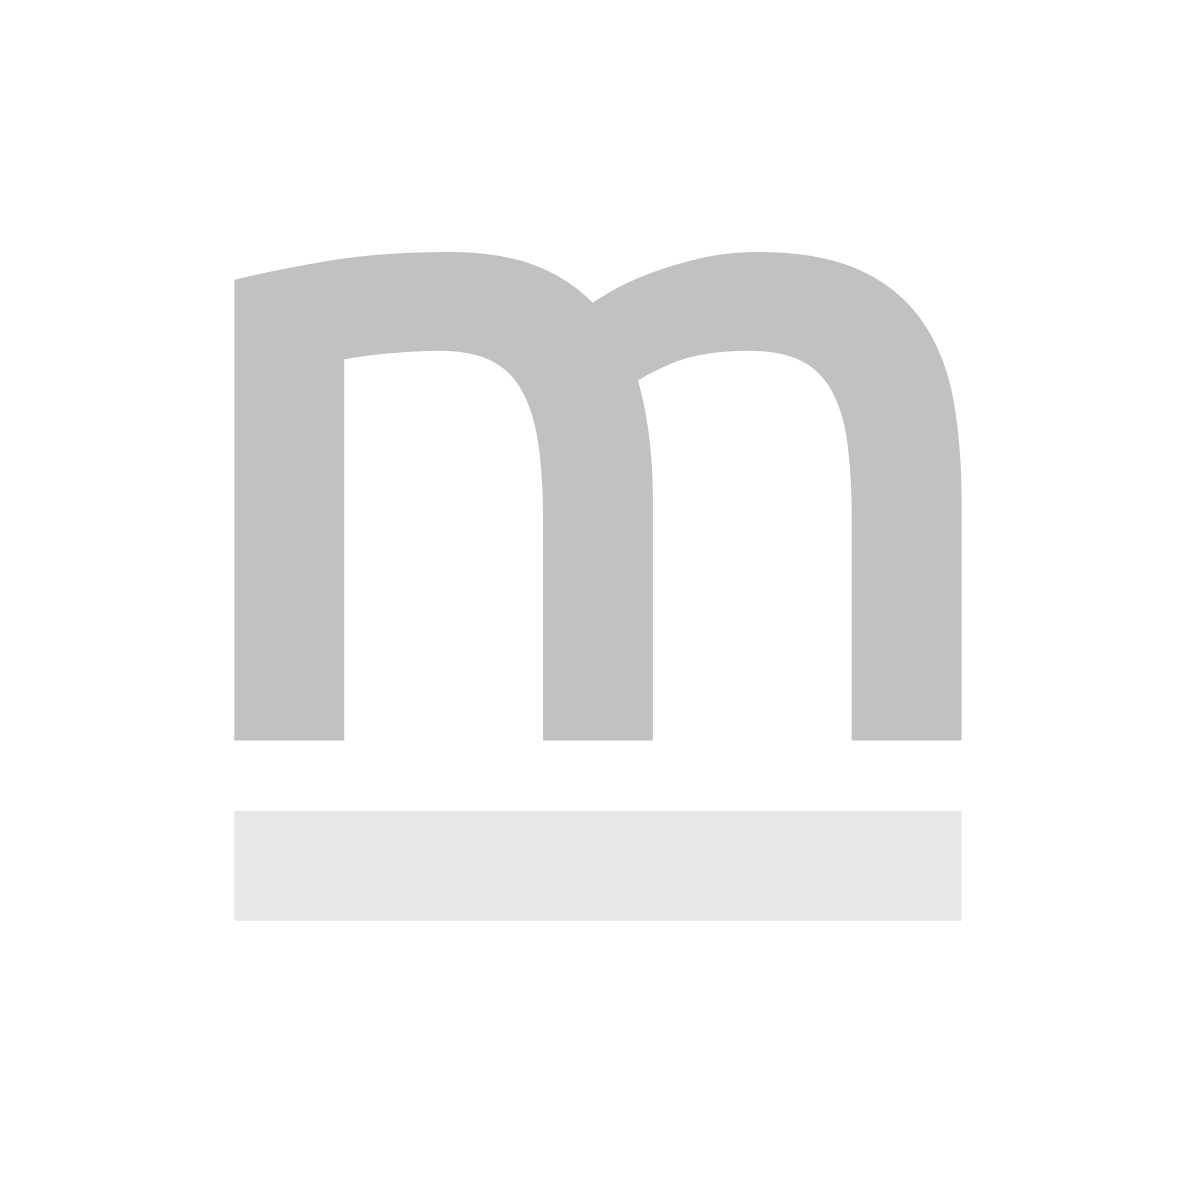 Biurko PICCOLINO z krzesłem